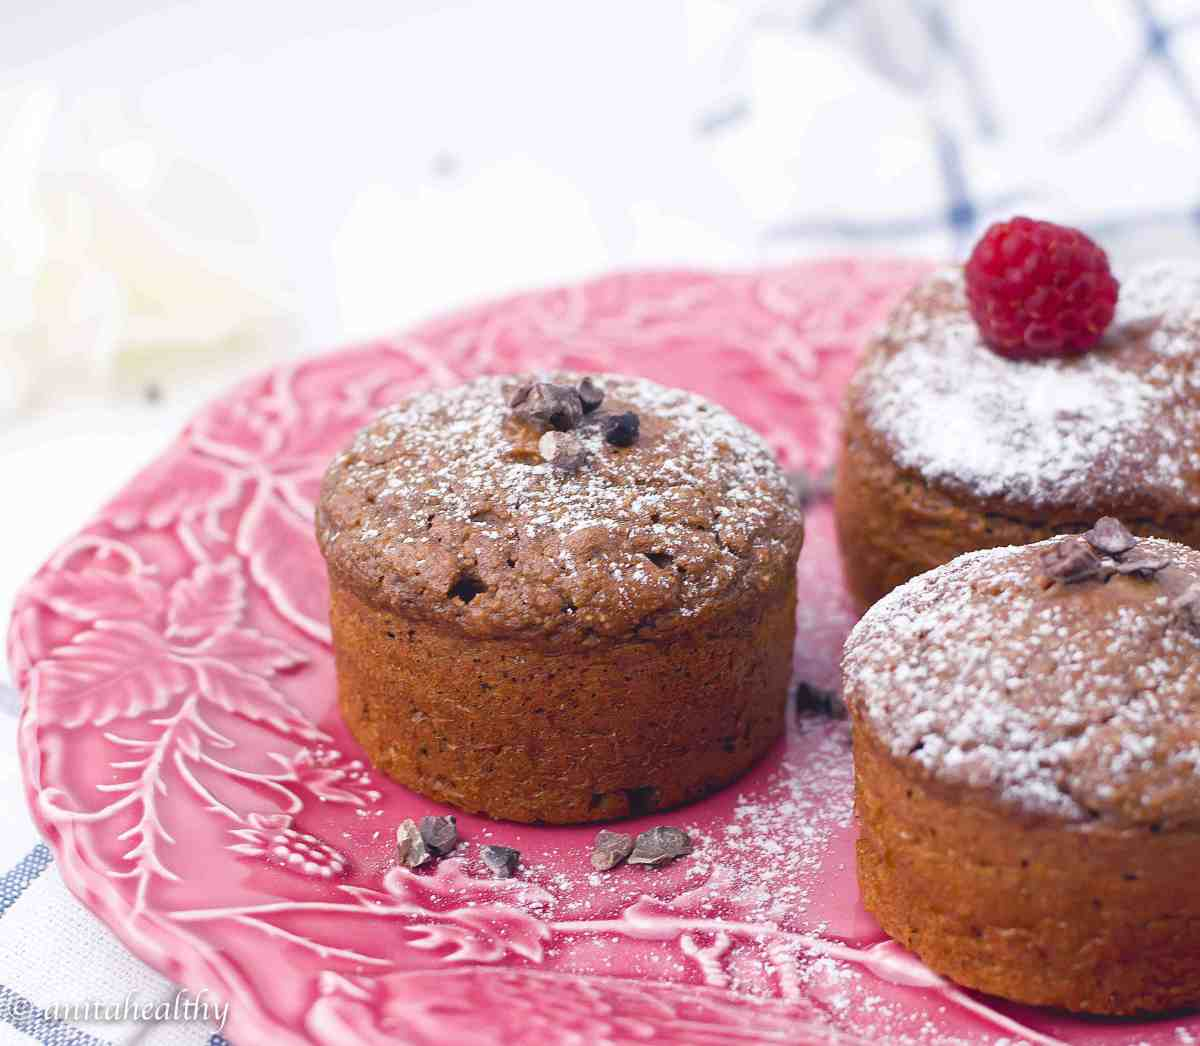 Muffins chocolate gluten-free | Anita Healthy